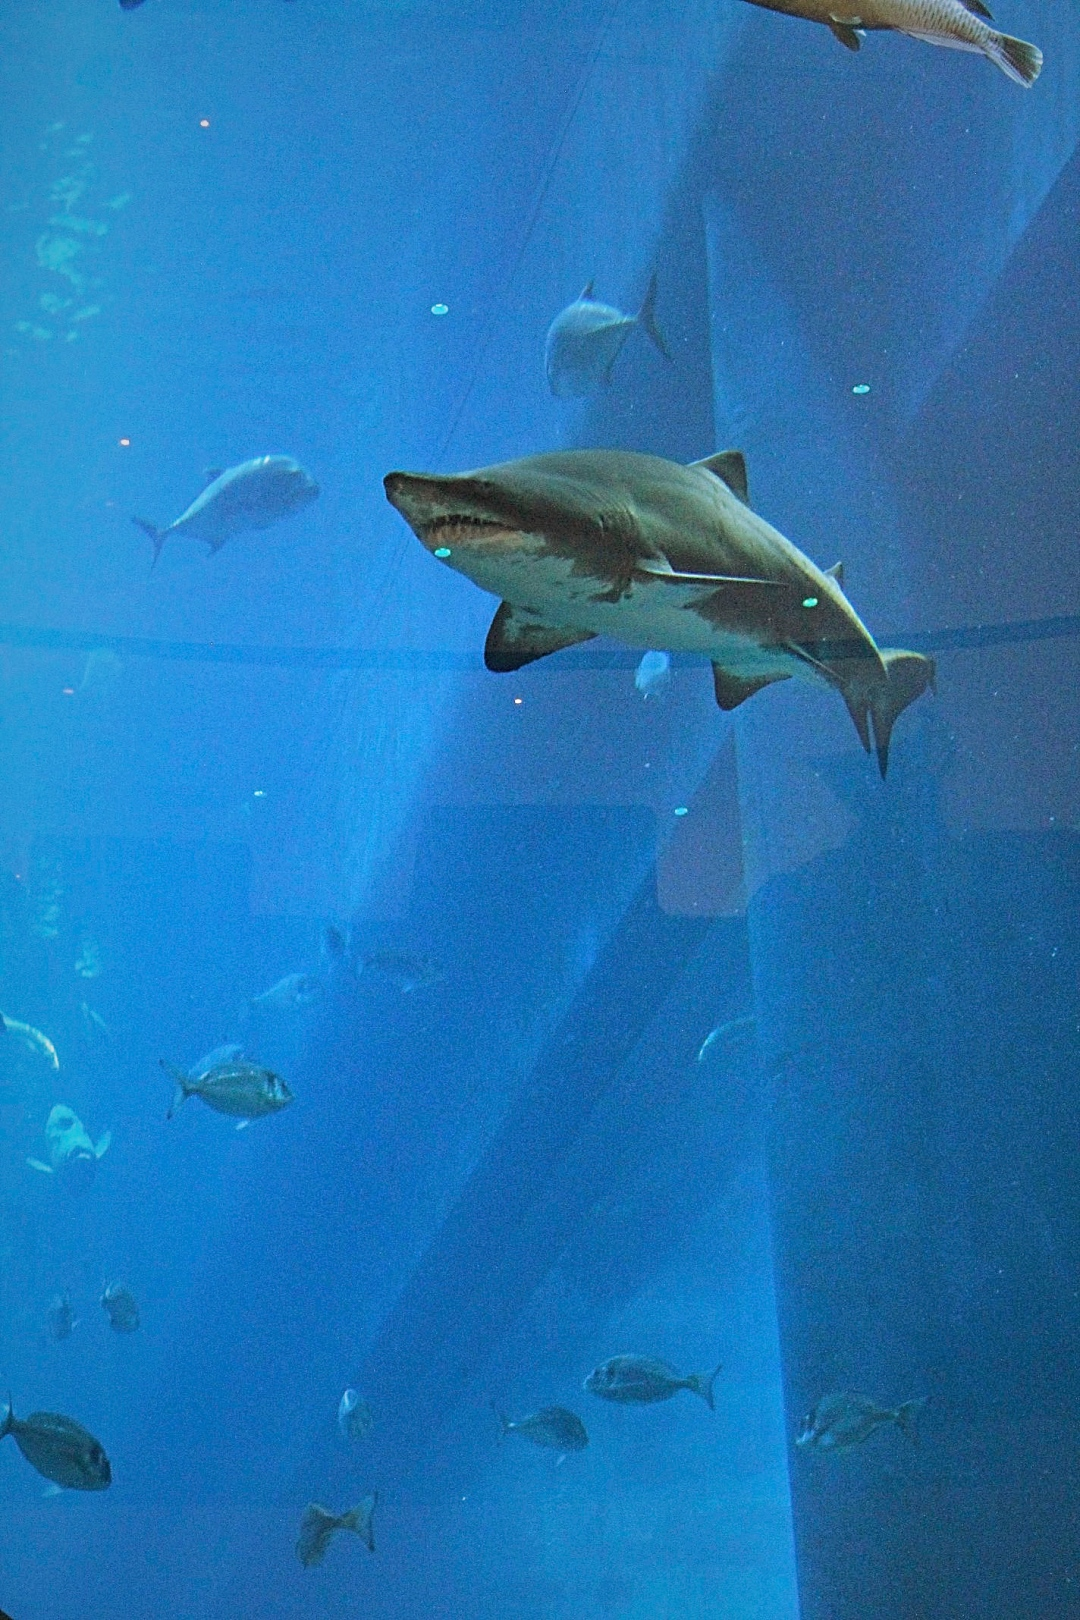 Sharknado - Dubai